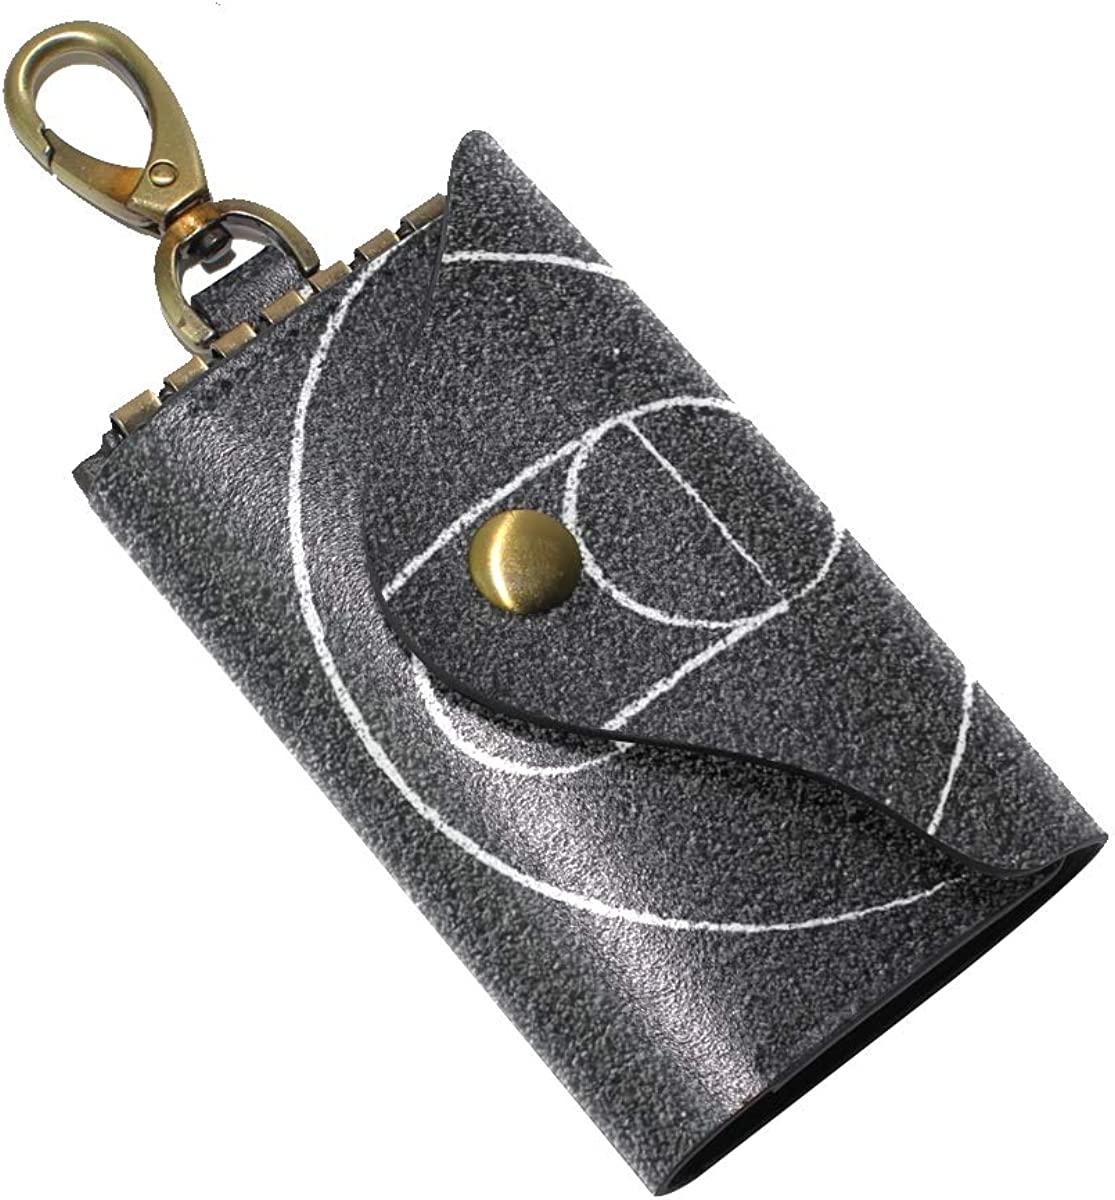 KEAKIA Street Basketball Court Leather Key Case Wallets Tri-fold Key Holder Keychains with 6 Hooks 2 Slot Snap Closure for Men Women